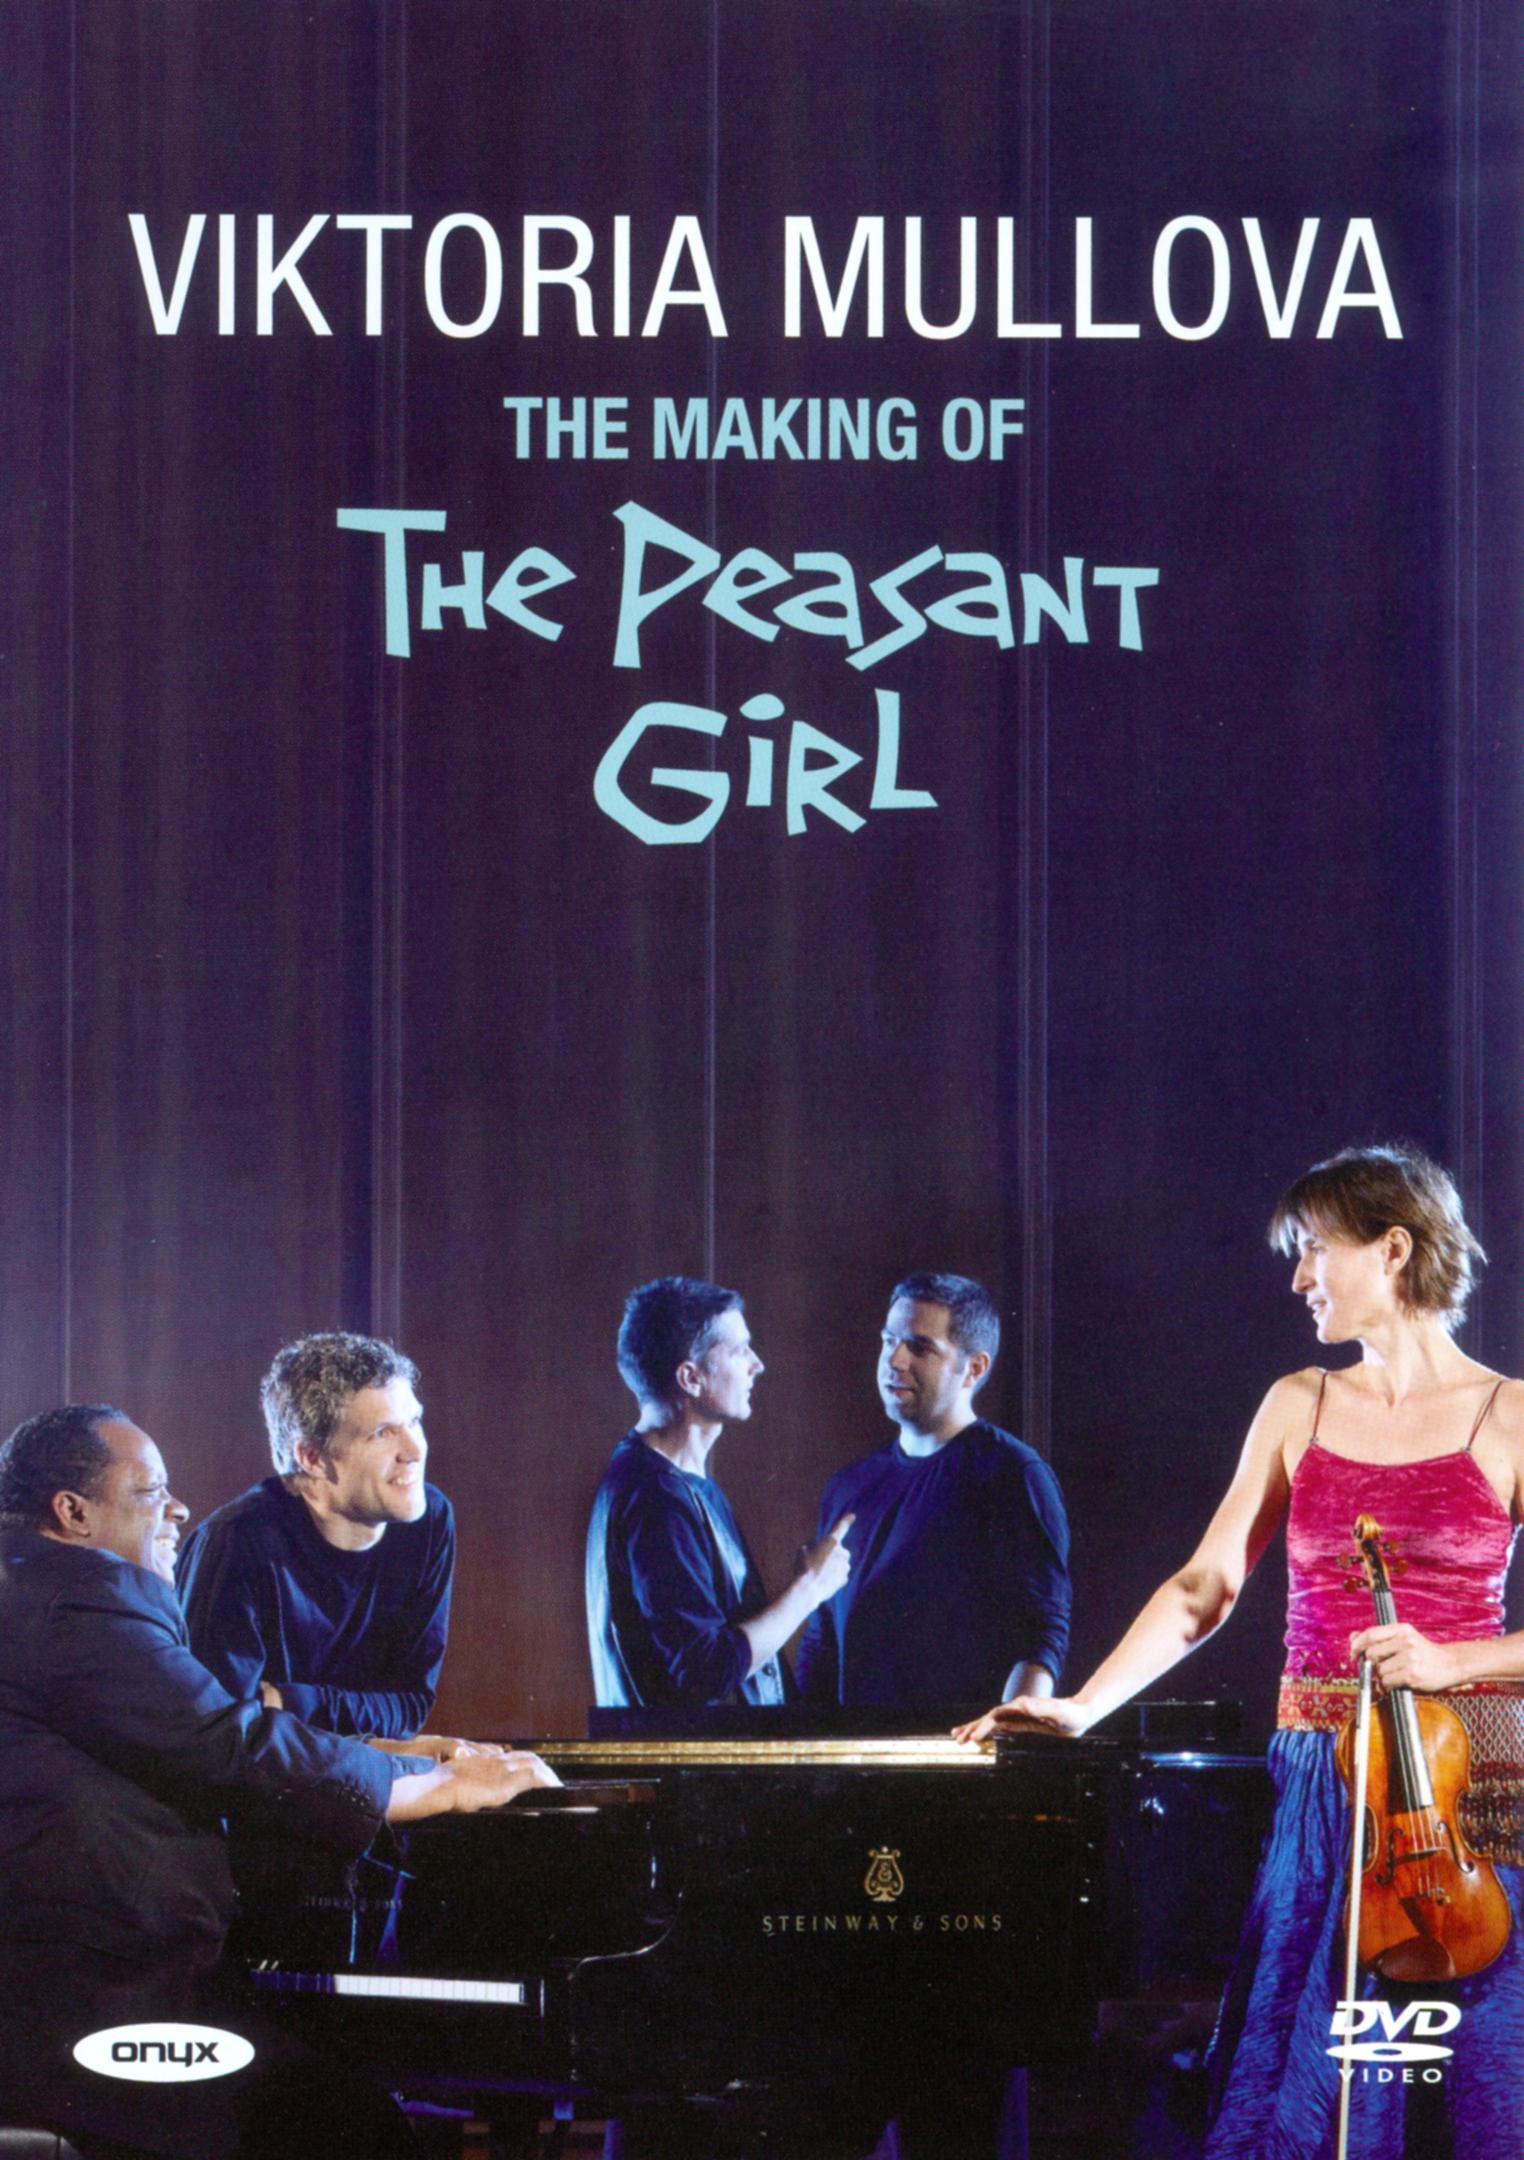 Viktoria Mullova: The Making of the Peasant Girl